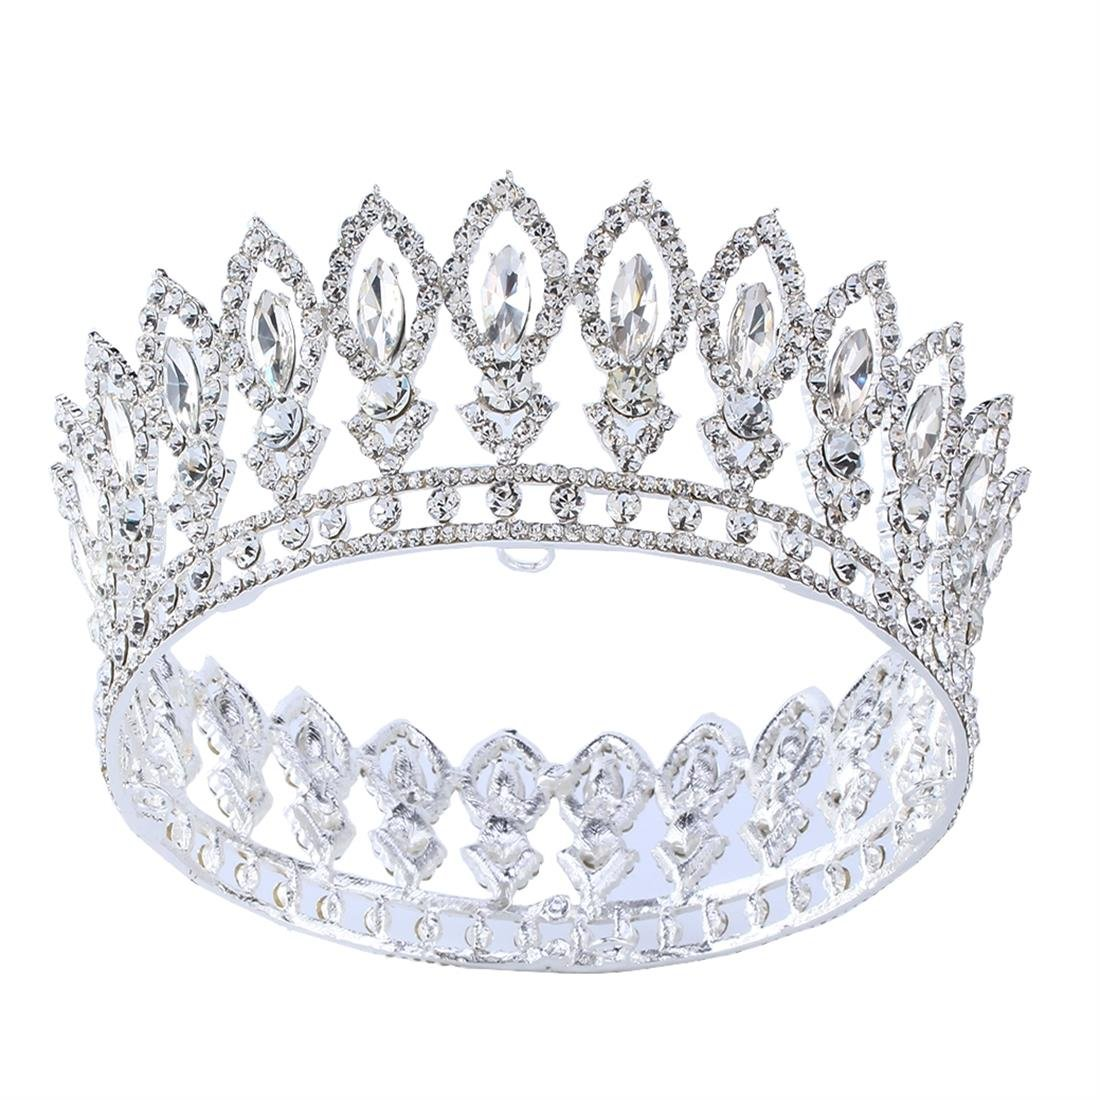 Stuffwholesale Princess Full Crown Wedding Party Hair Jewelry Gold Tiara (Silver/Crystal)